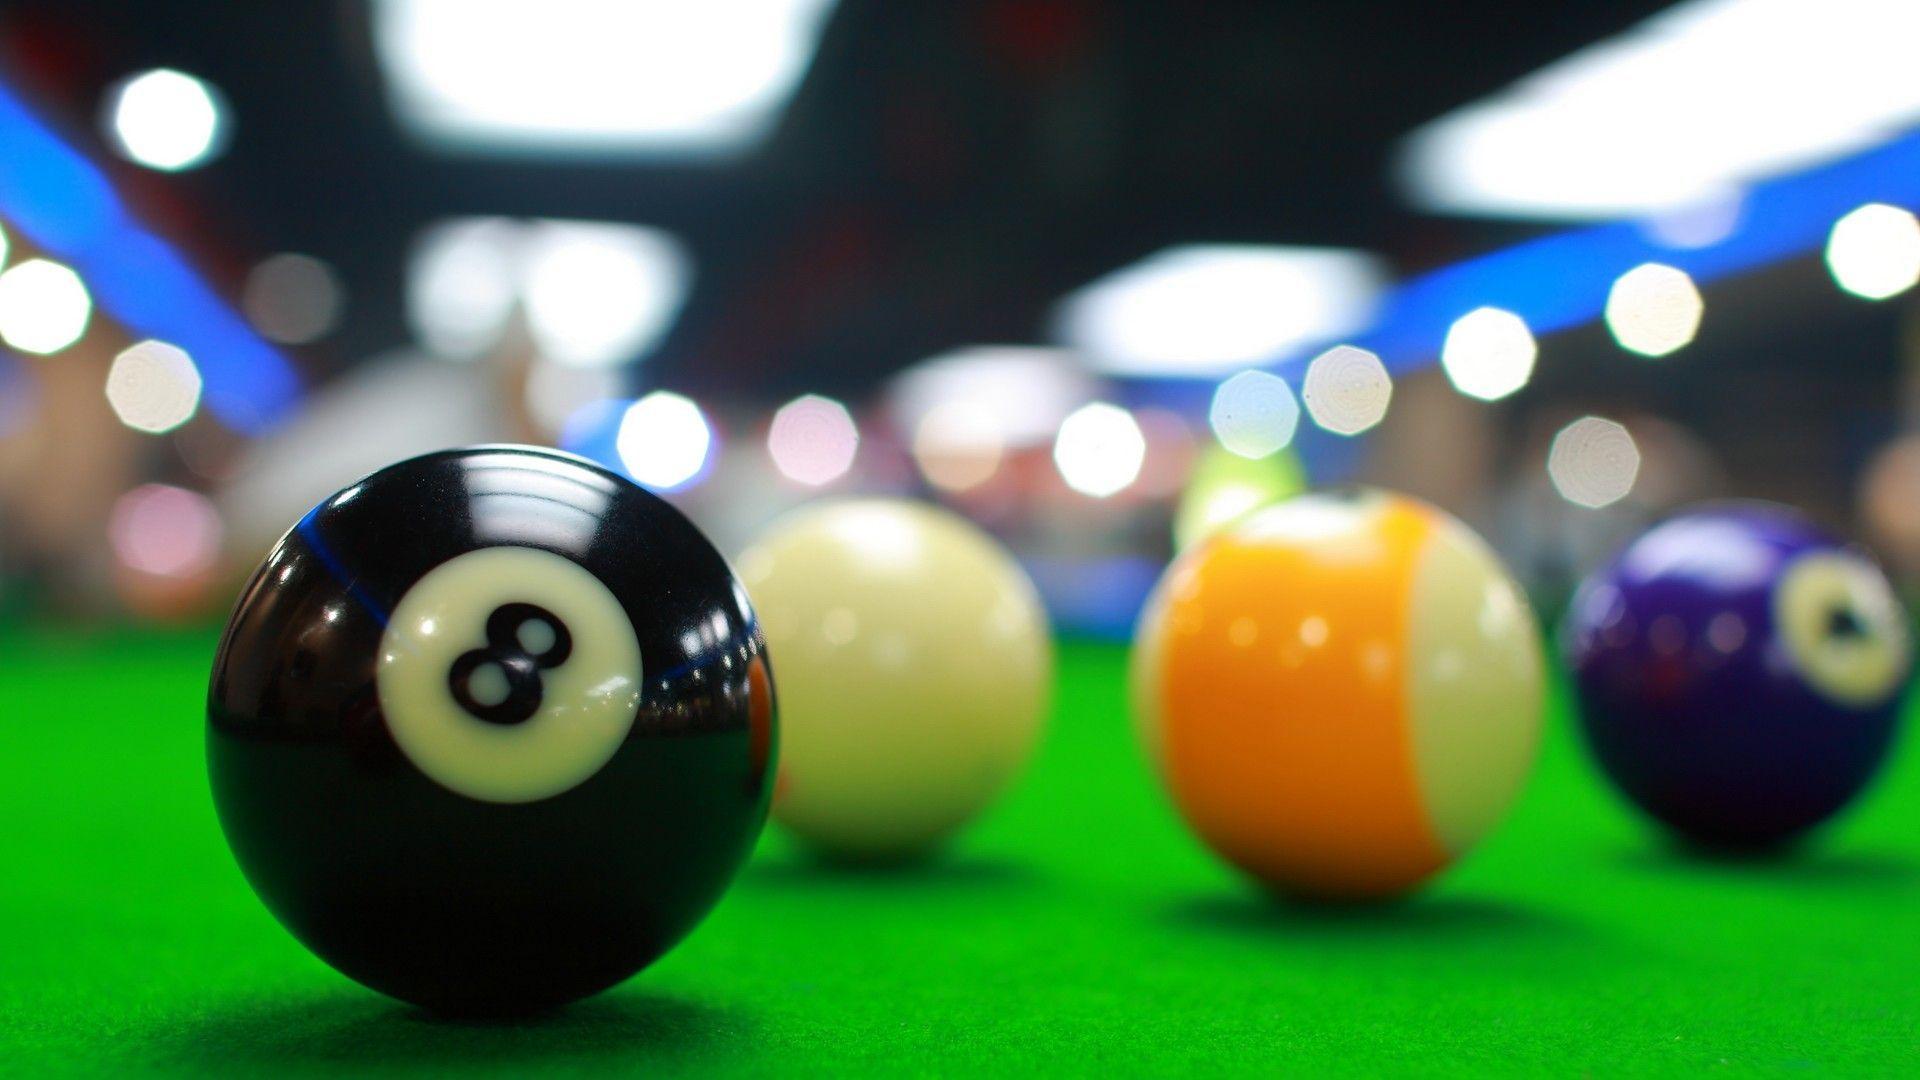 top Billiard Balls Wallpaper